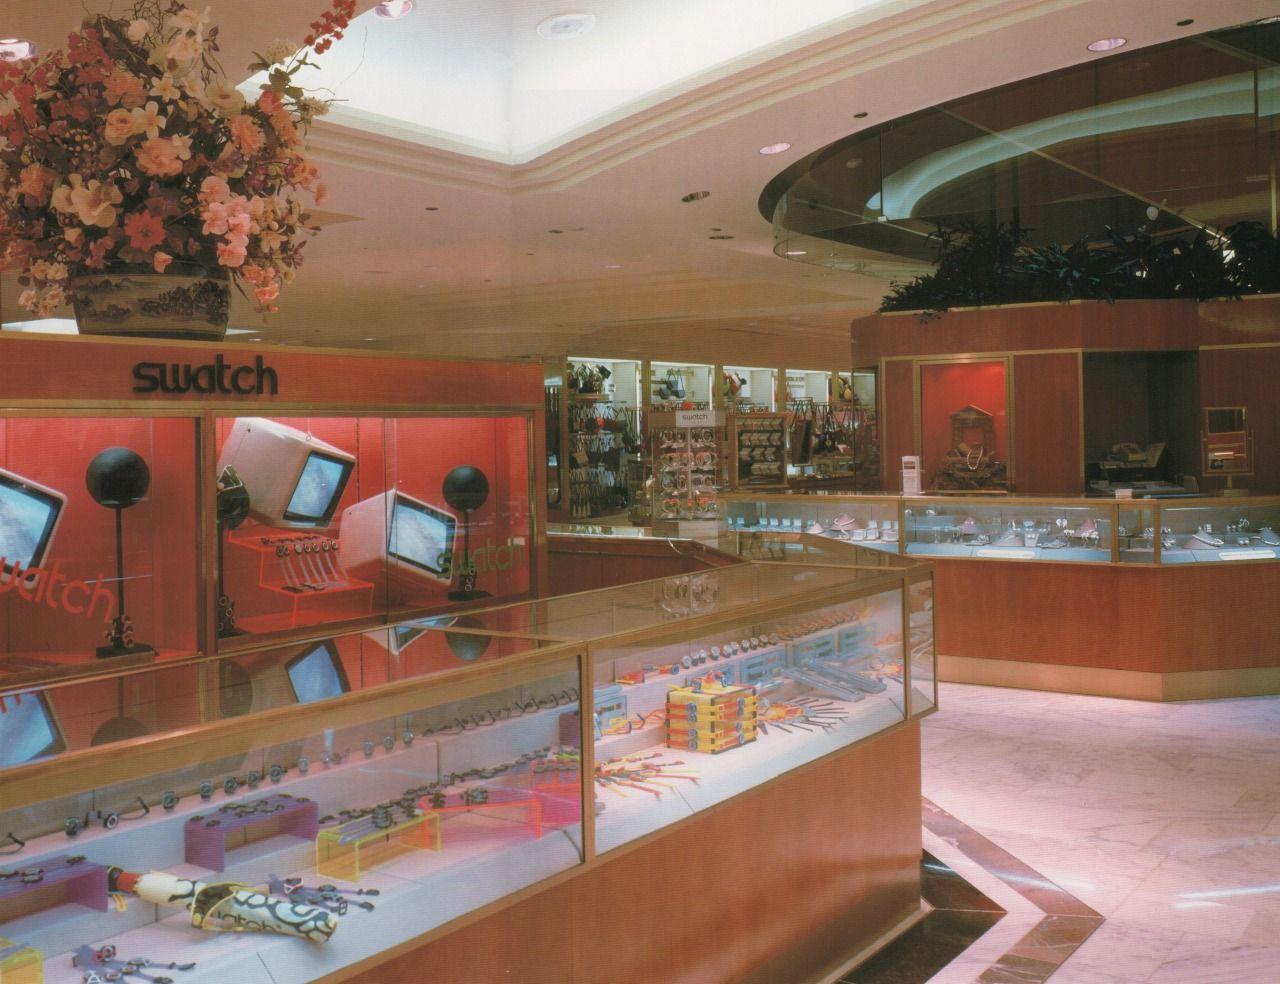 Macys s galleria dallas texas from the best of - Interior design dallas texas ...